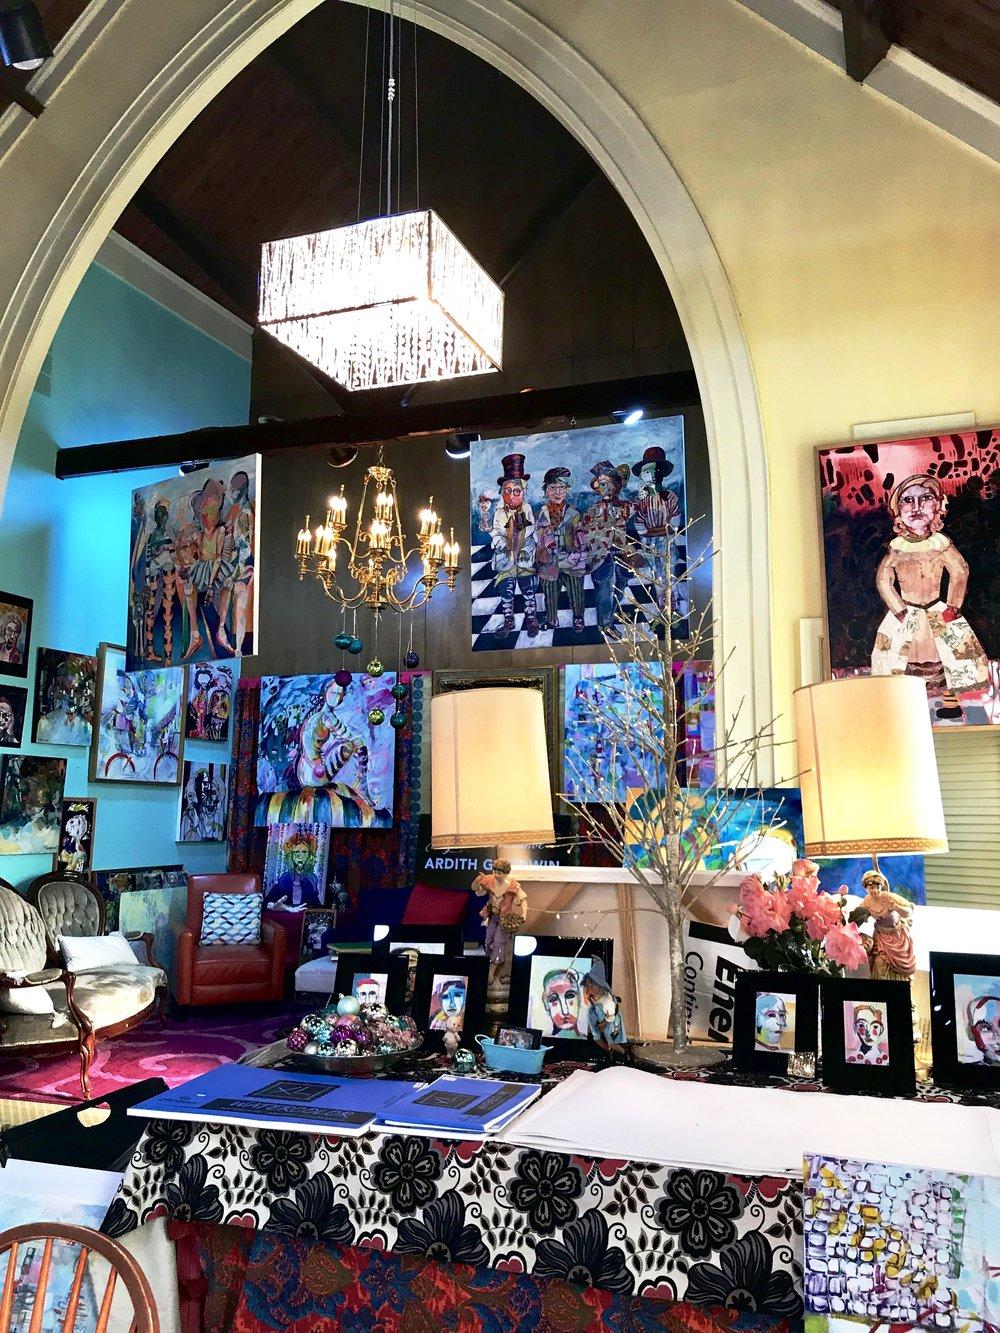 Ardith's Magikal Studio